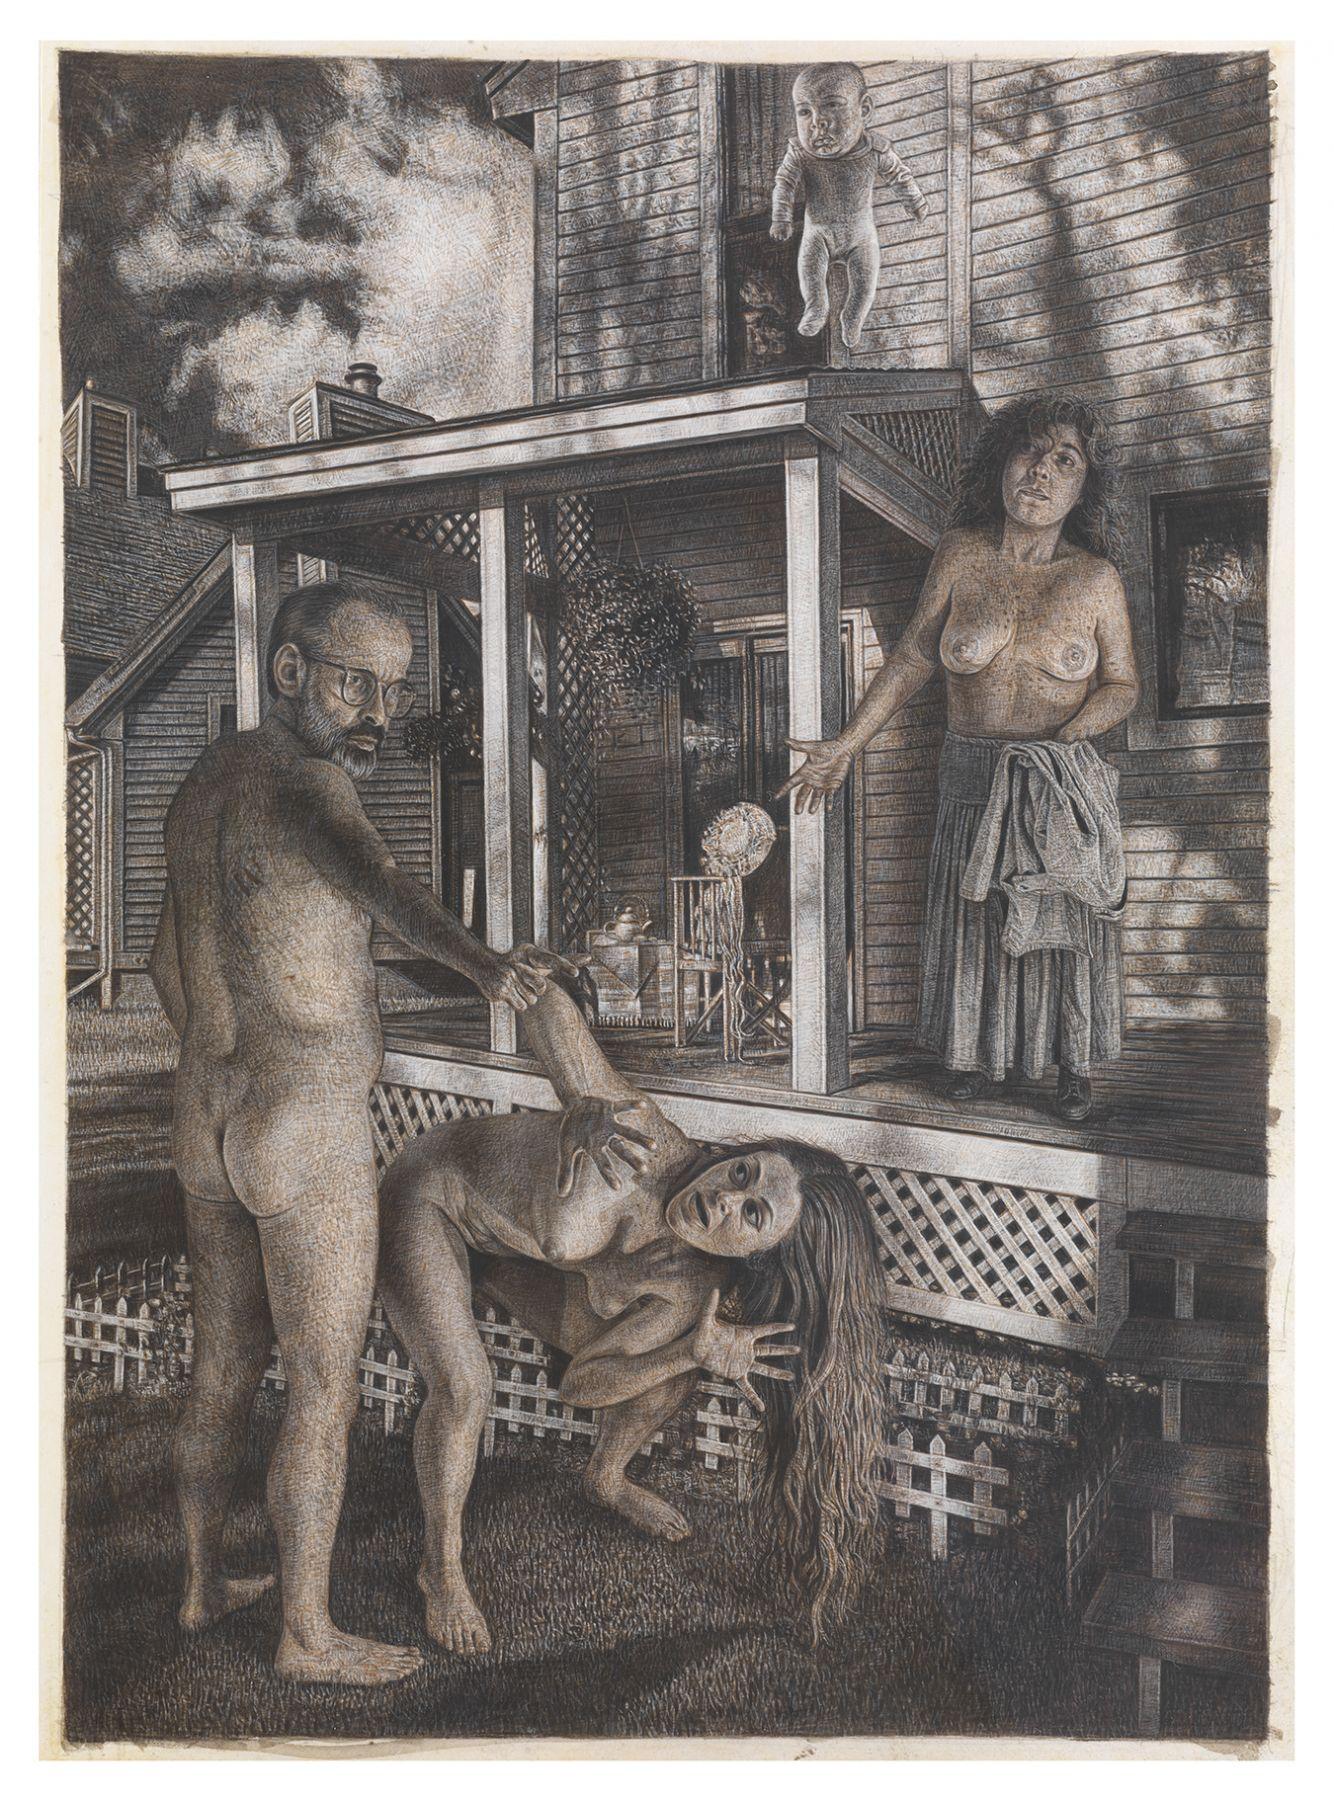 Mark Greenwold, The Backyard, 1988